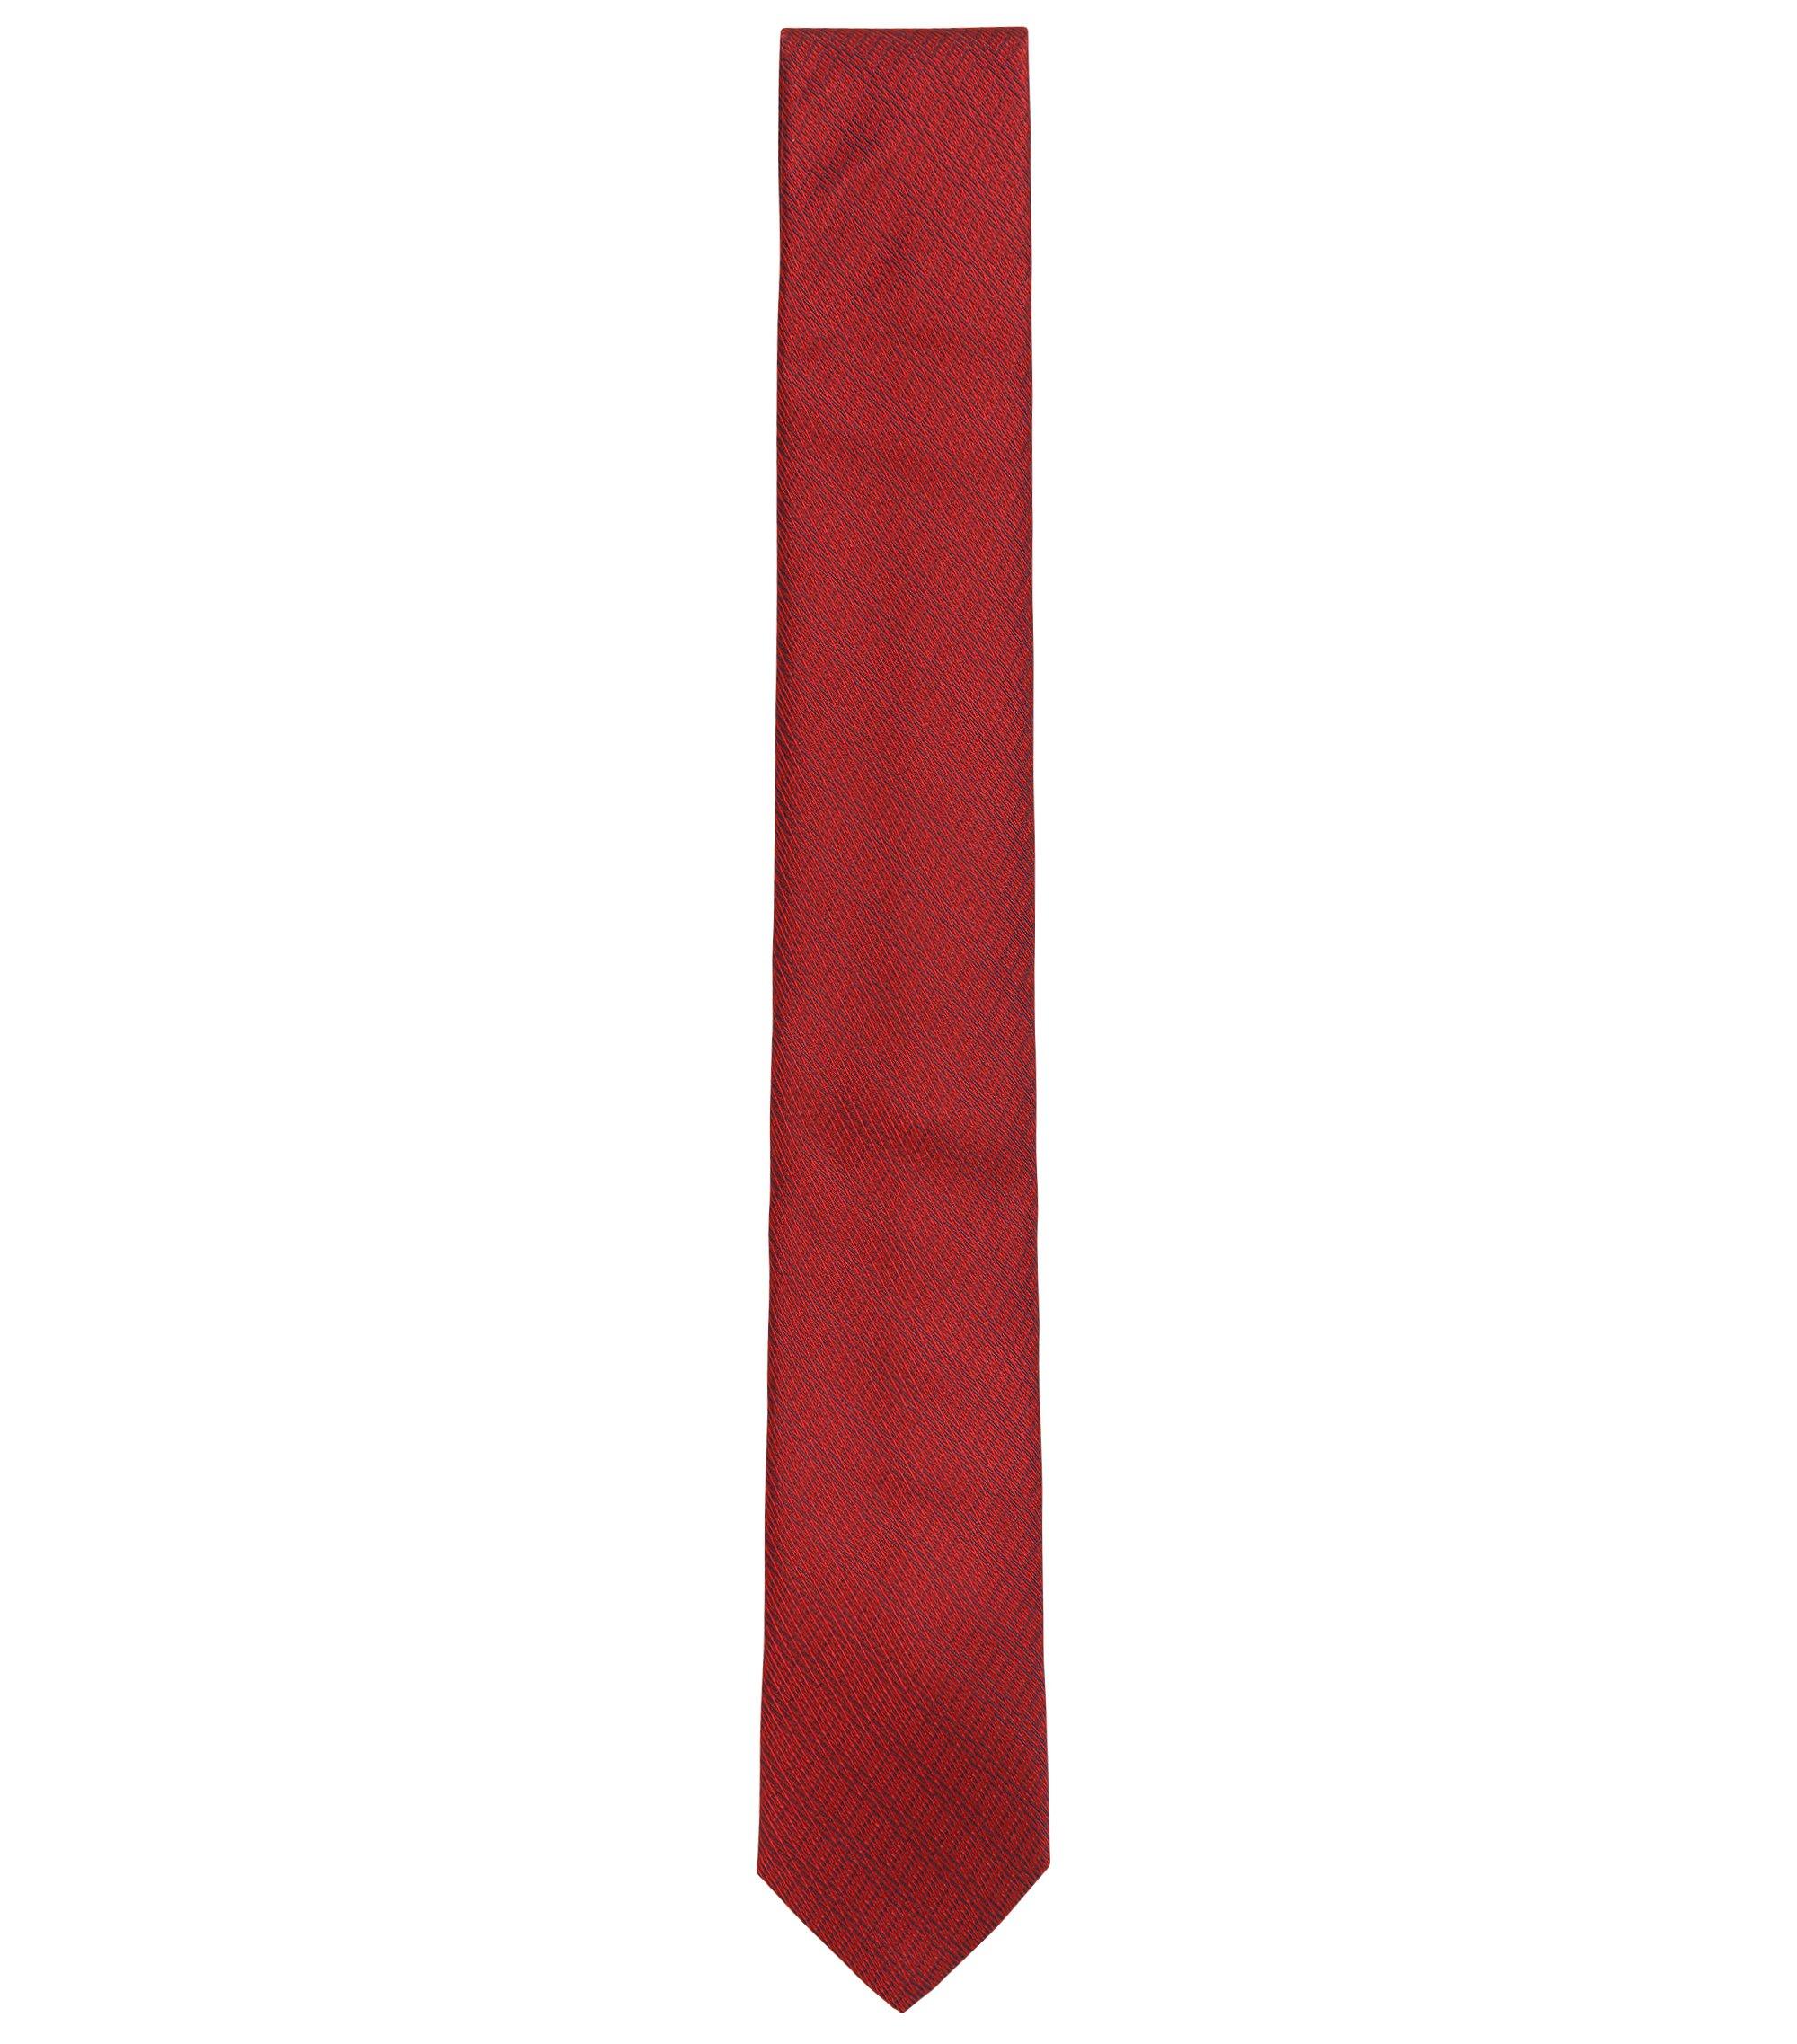 Krawatte aus strukturiertem Seiden-Jacquard, Rot